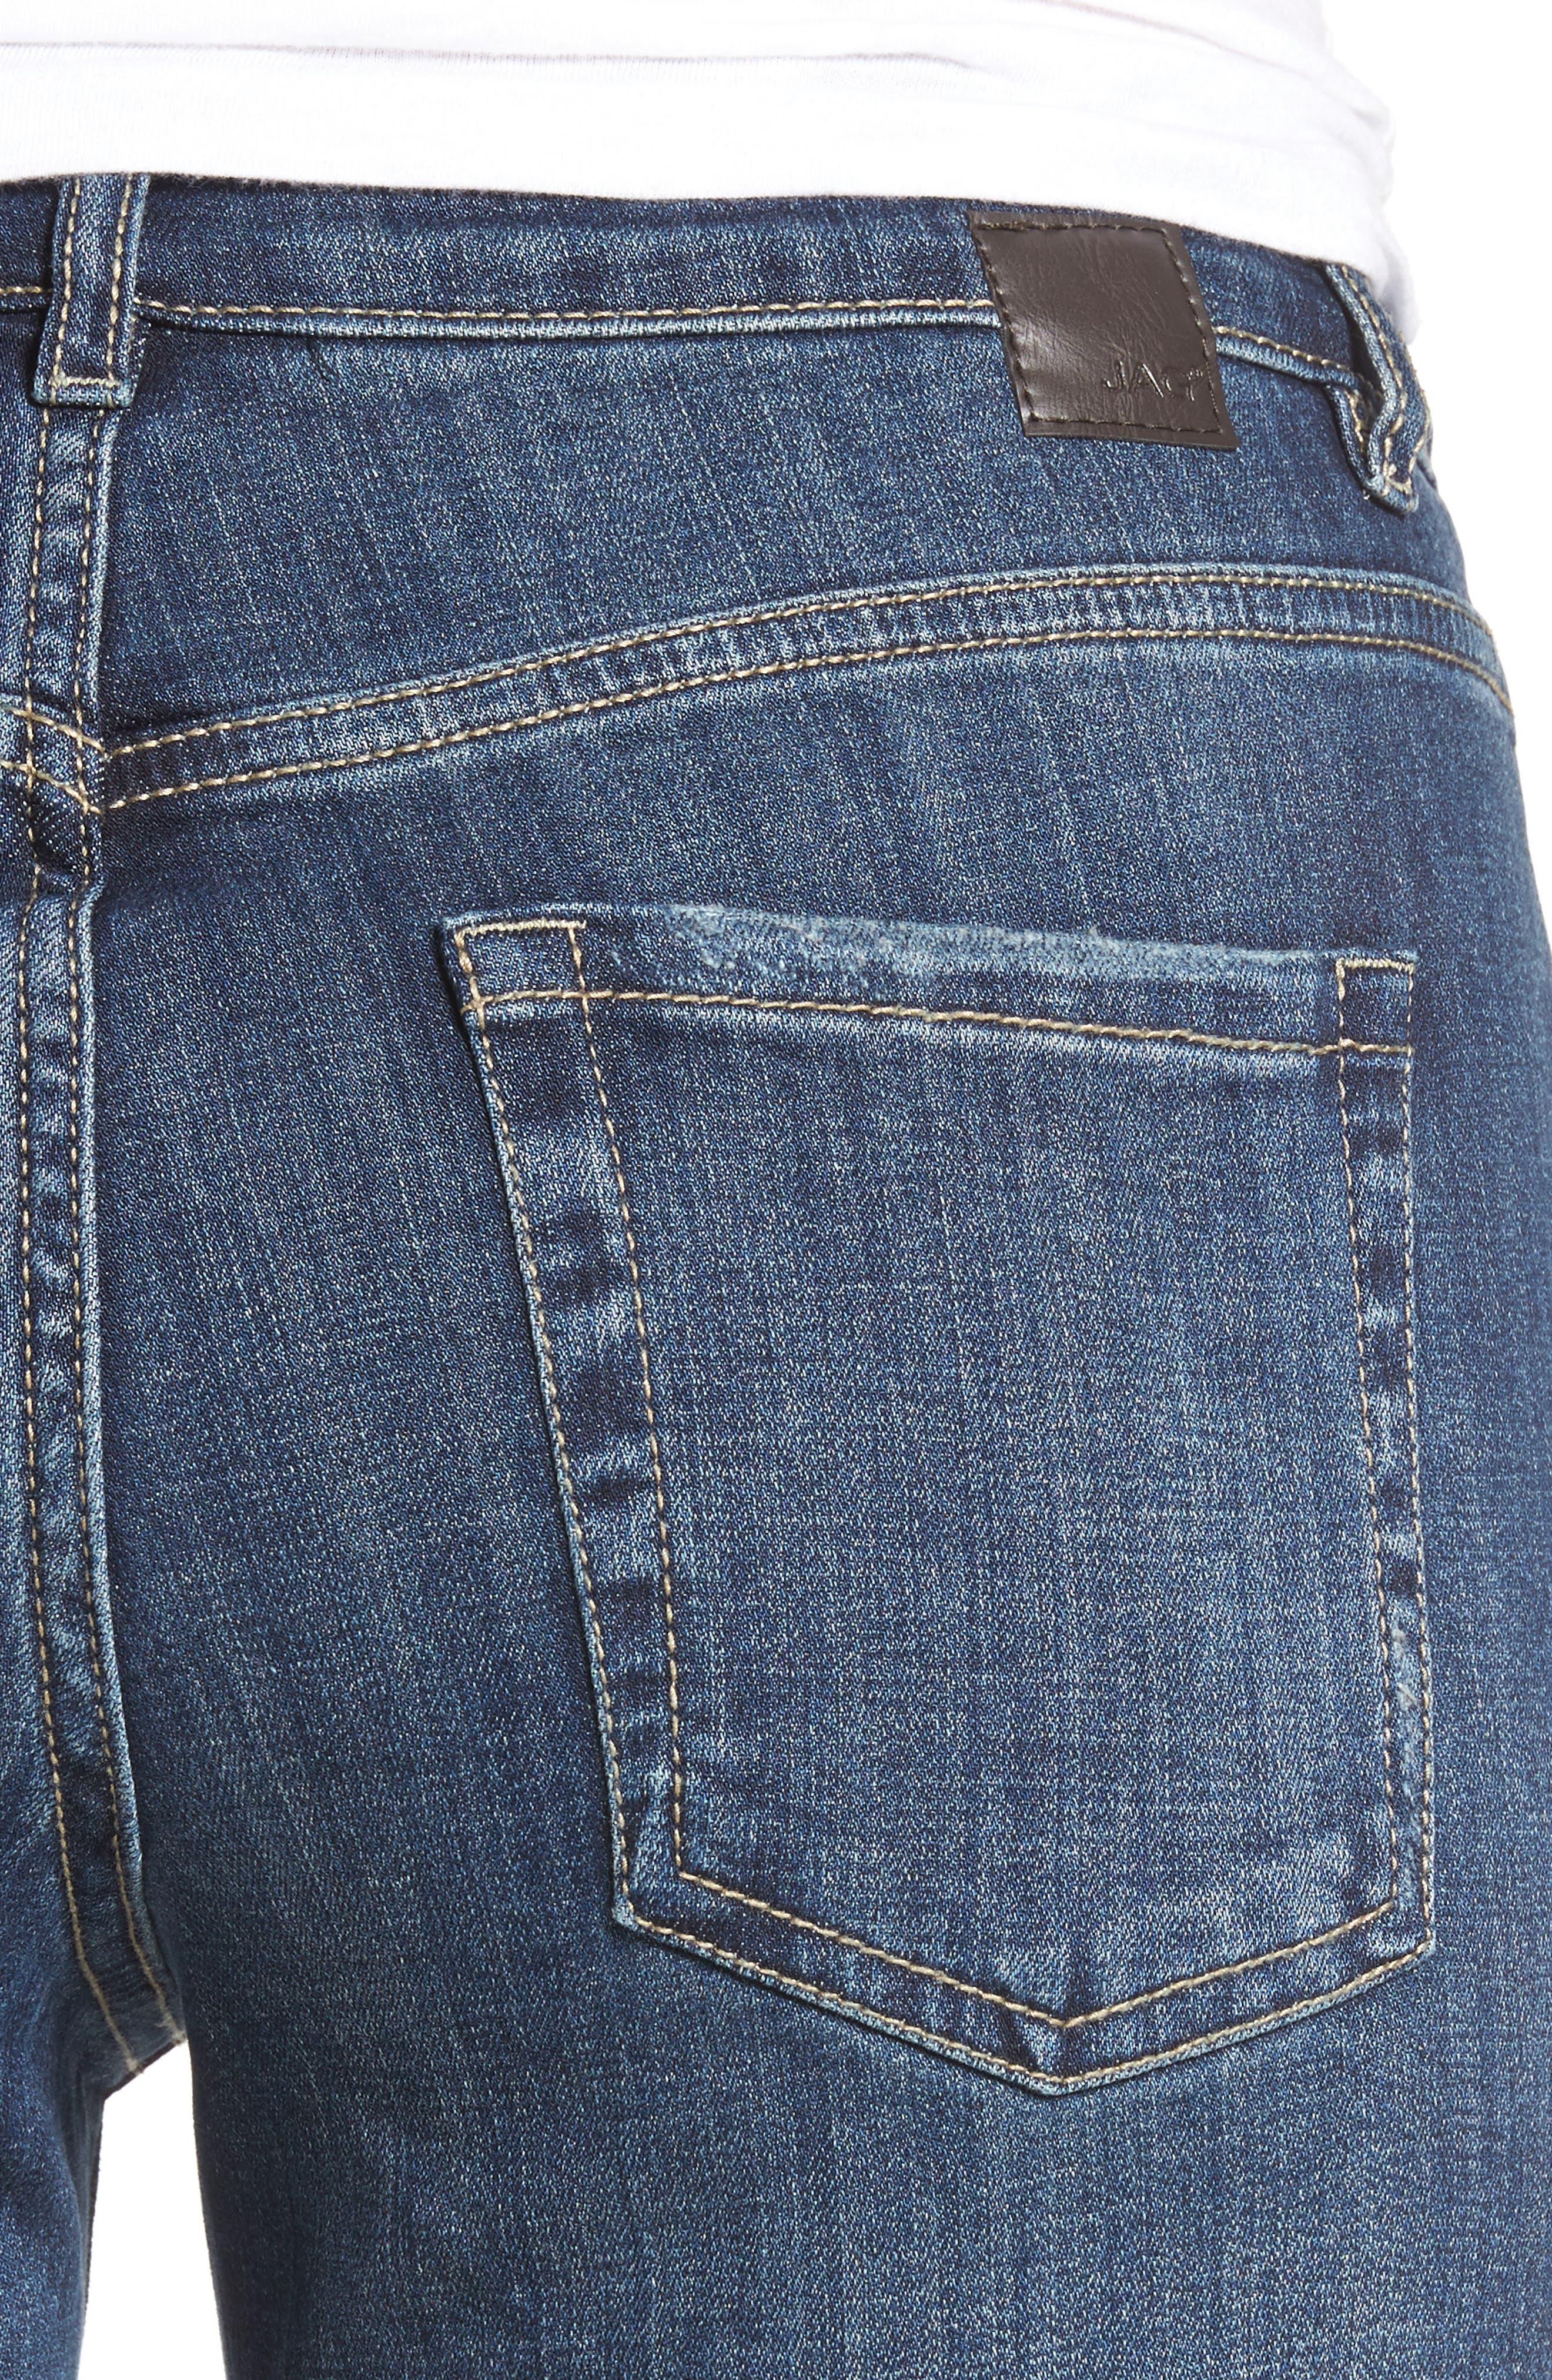 Carter Cuffed Stretch Girlfriend Jeans,                             Alternate thumbnail 4, color,                             MEDIUM INDIGO